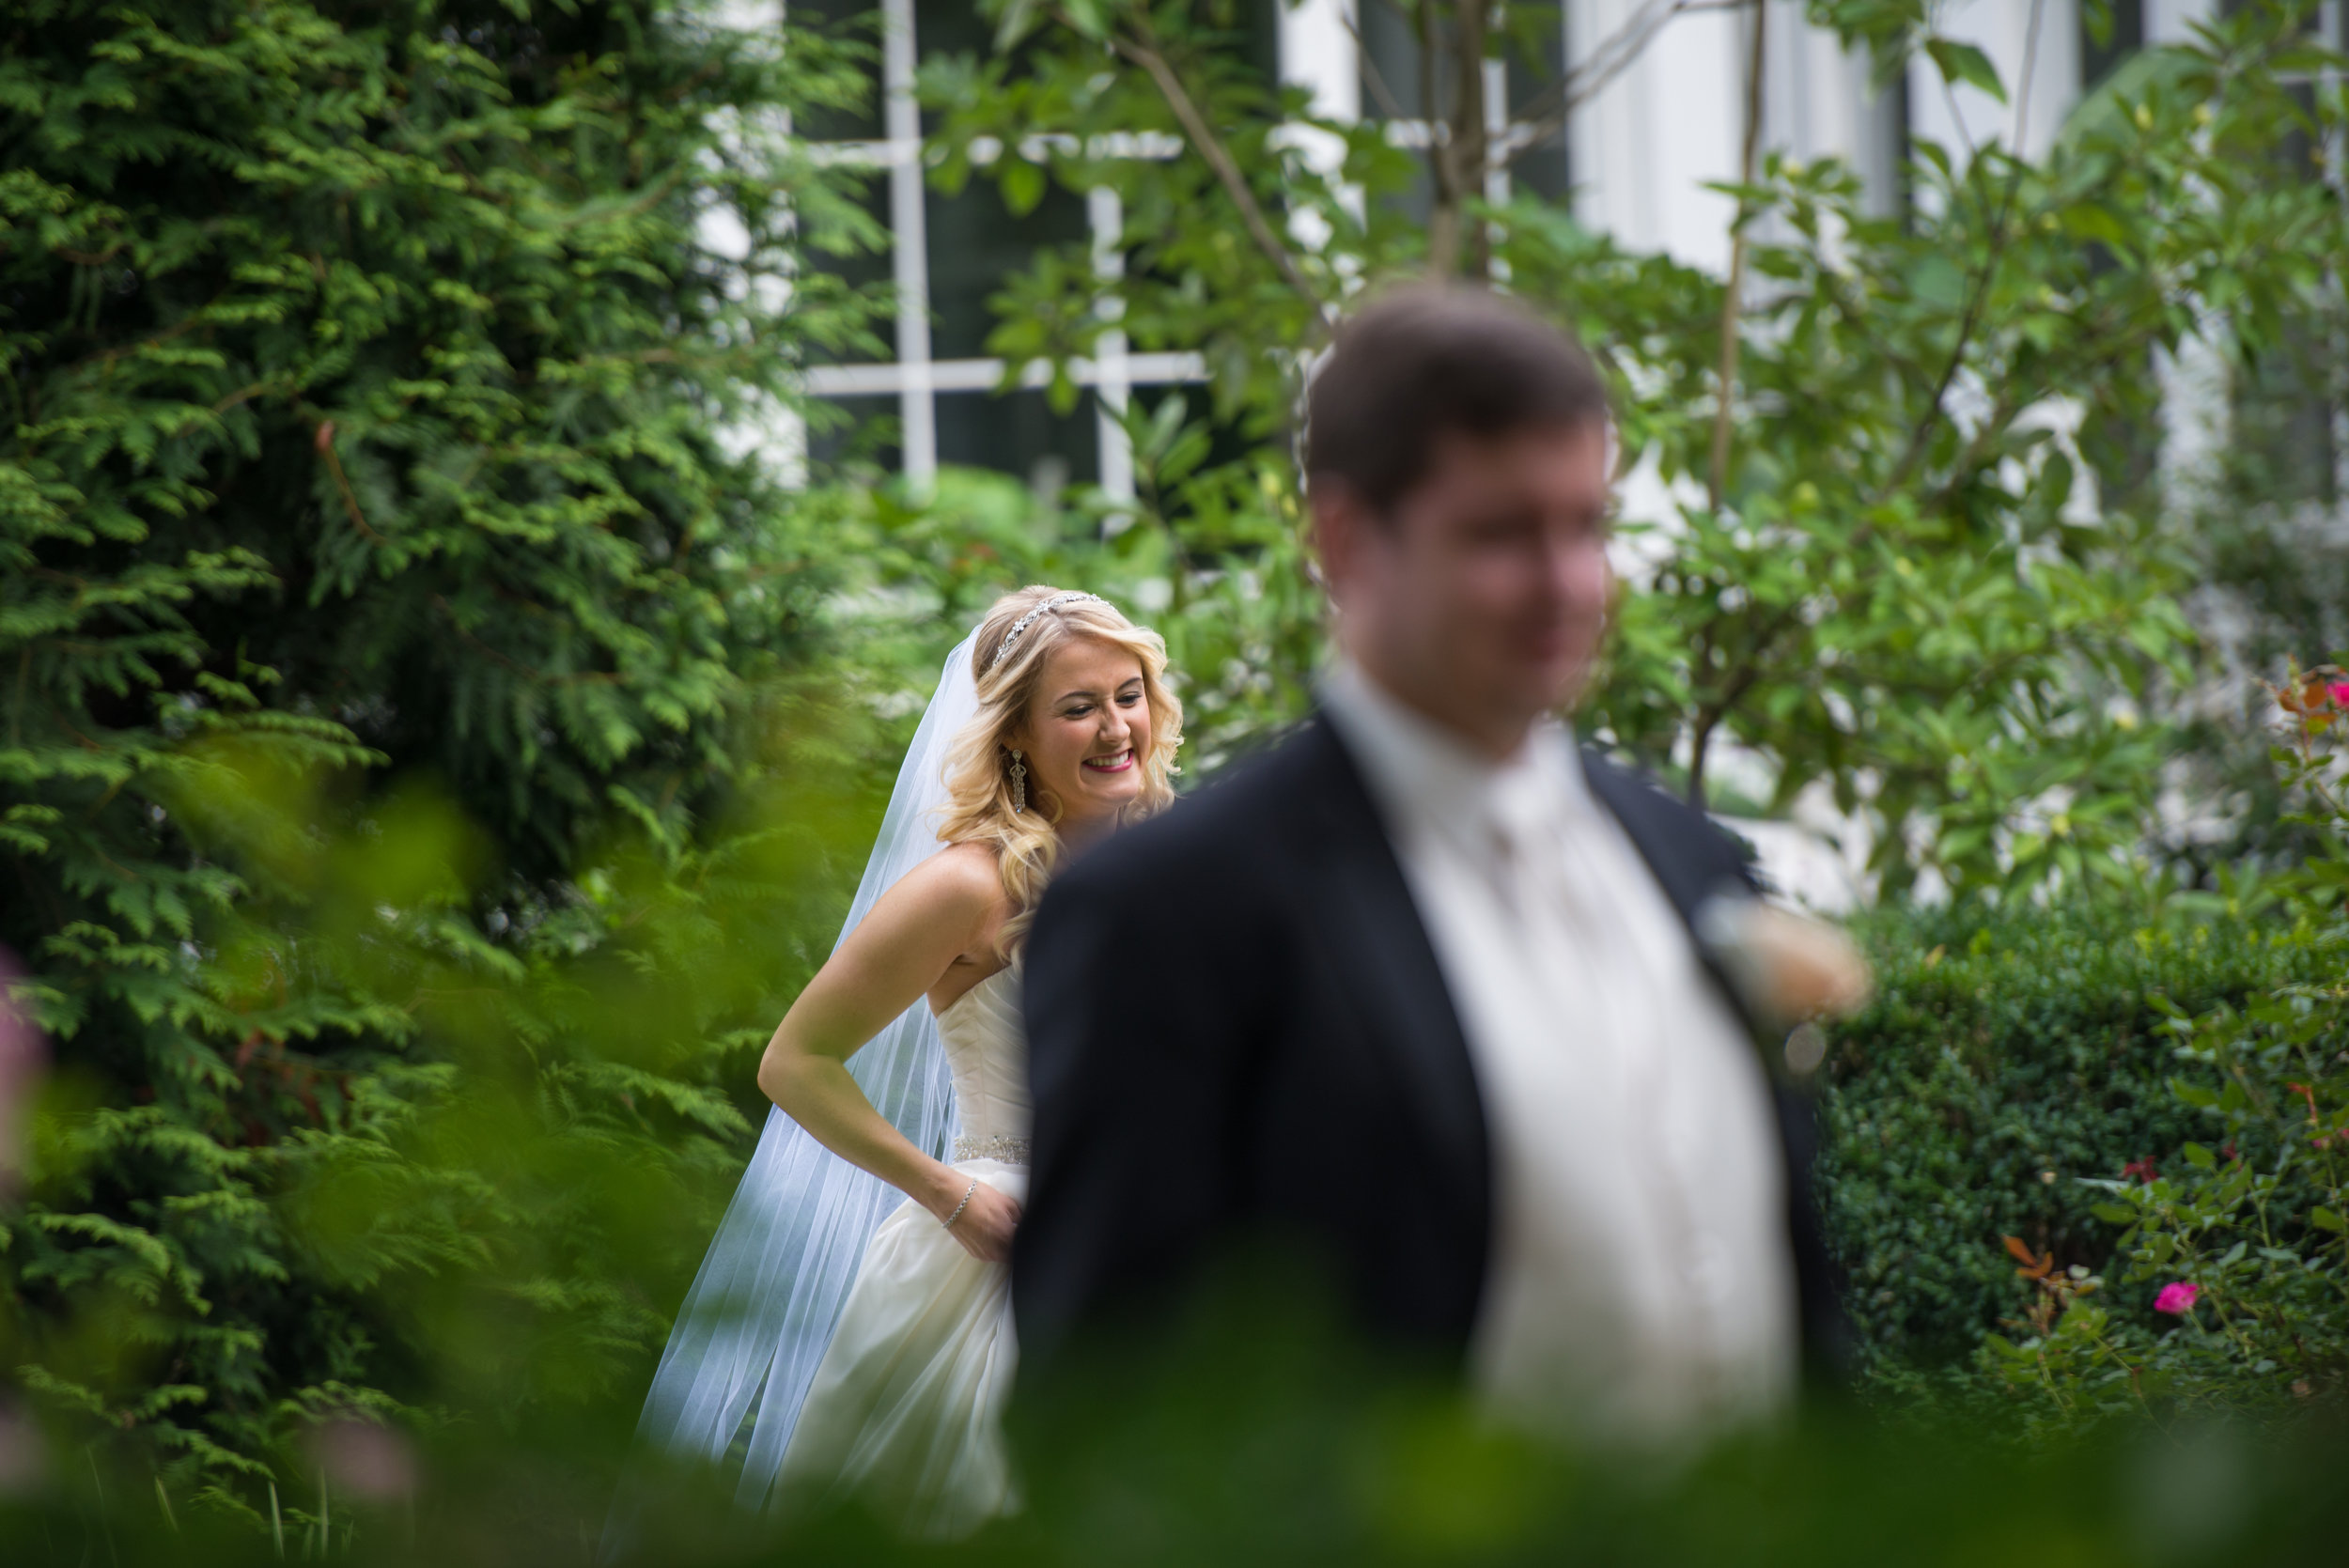 Wedding First Look Photos00916.jpg